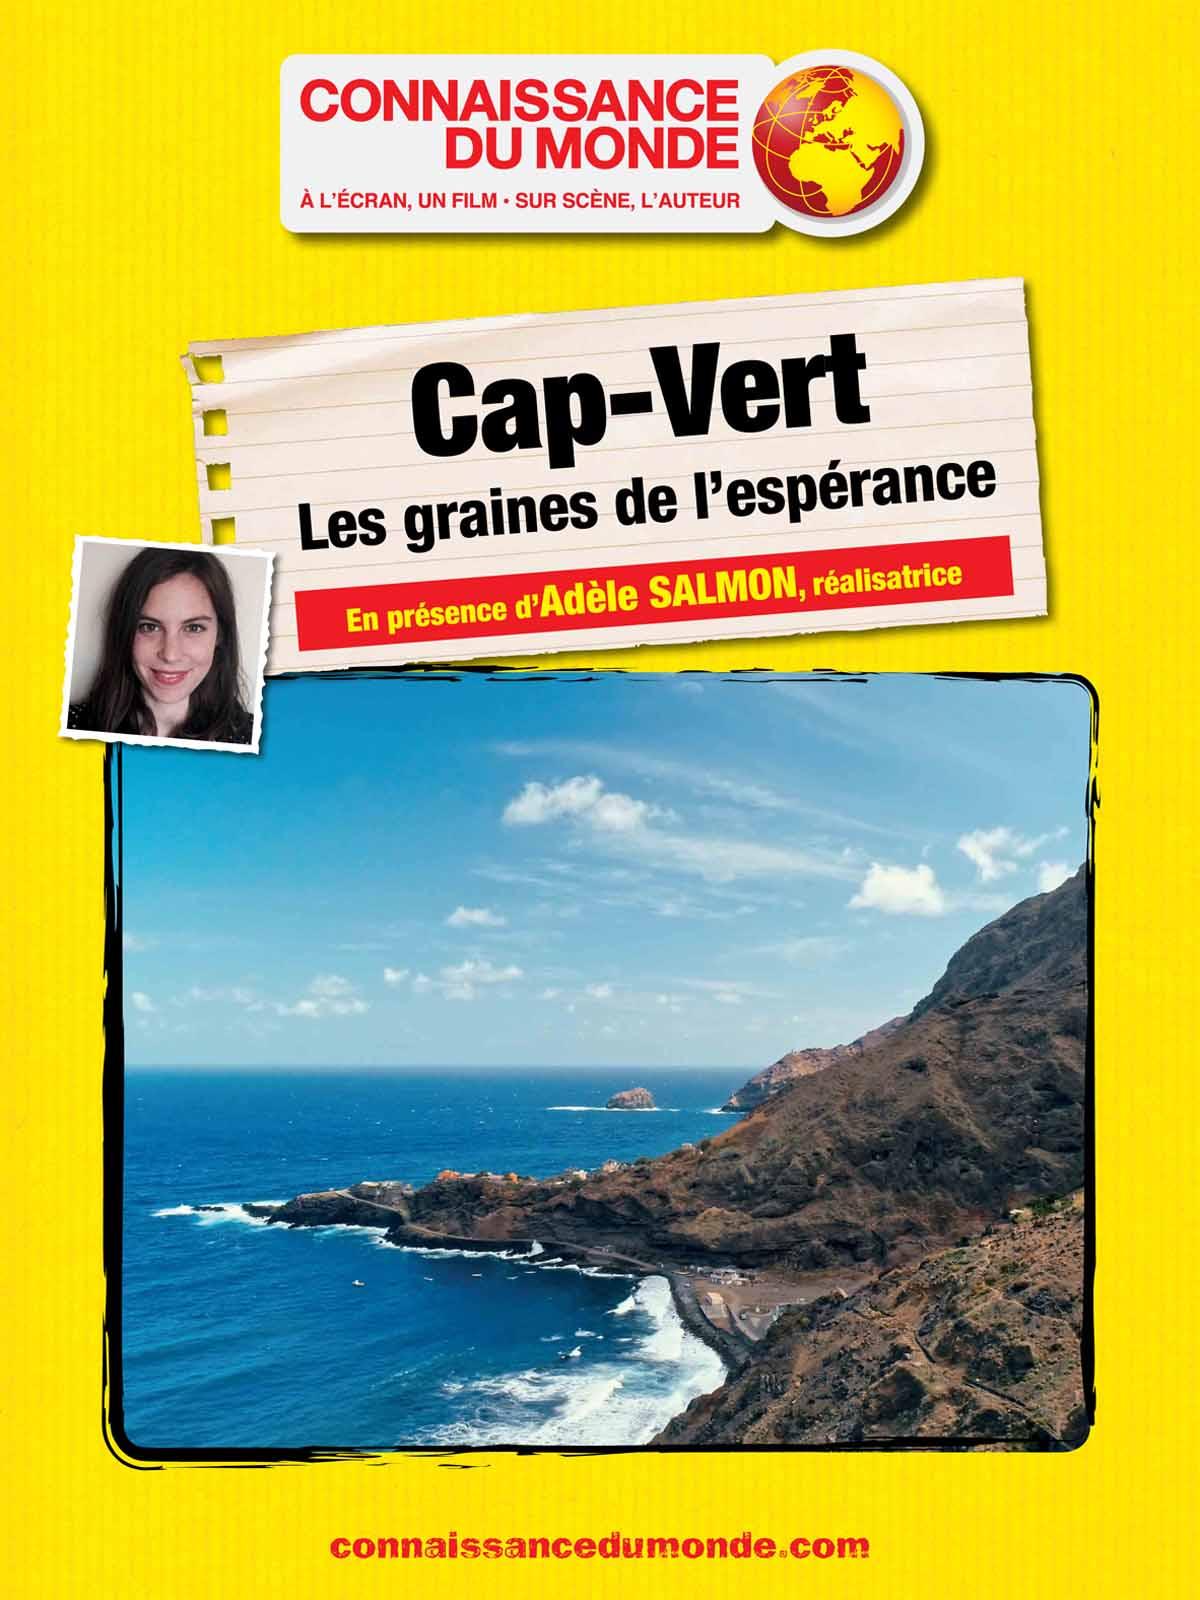 CAP-VERT, Les graines de l'espérance